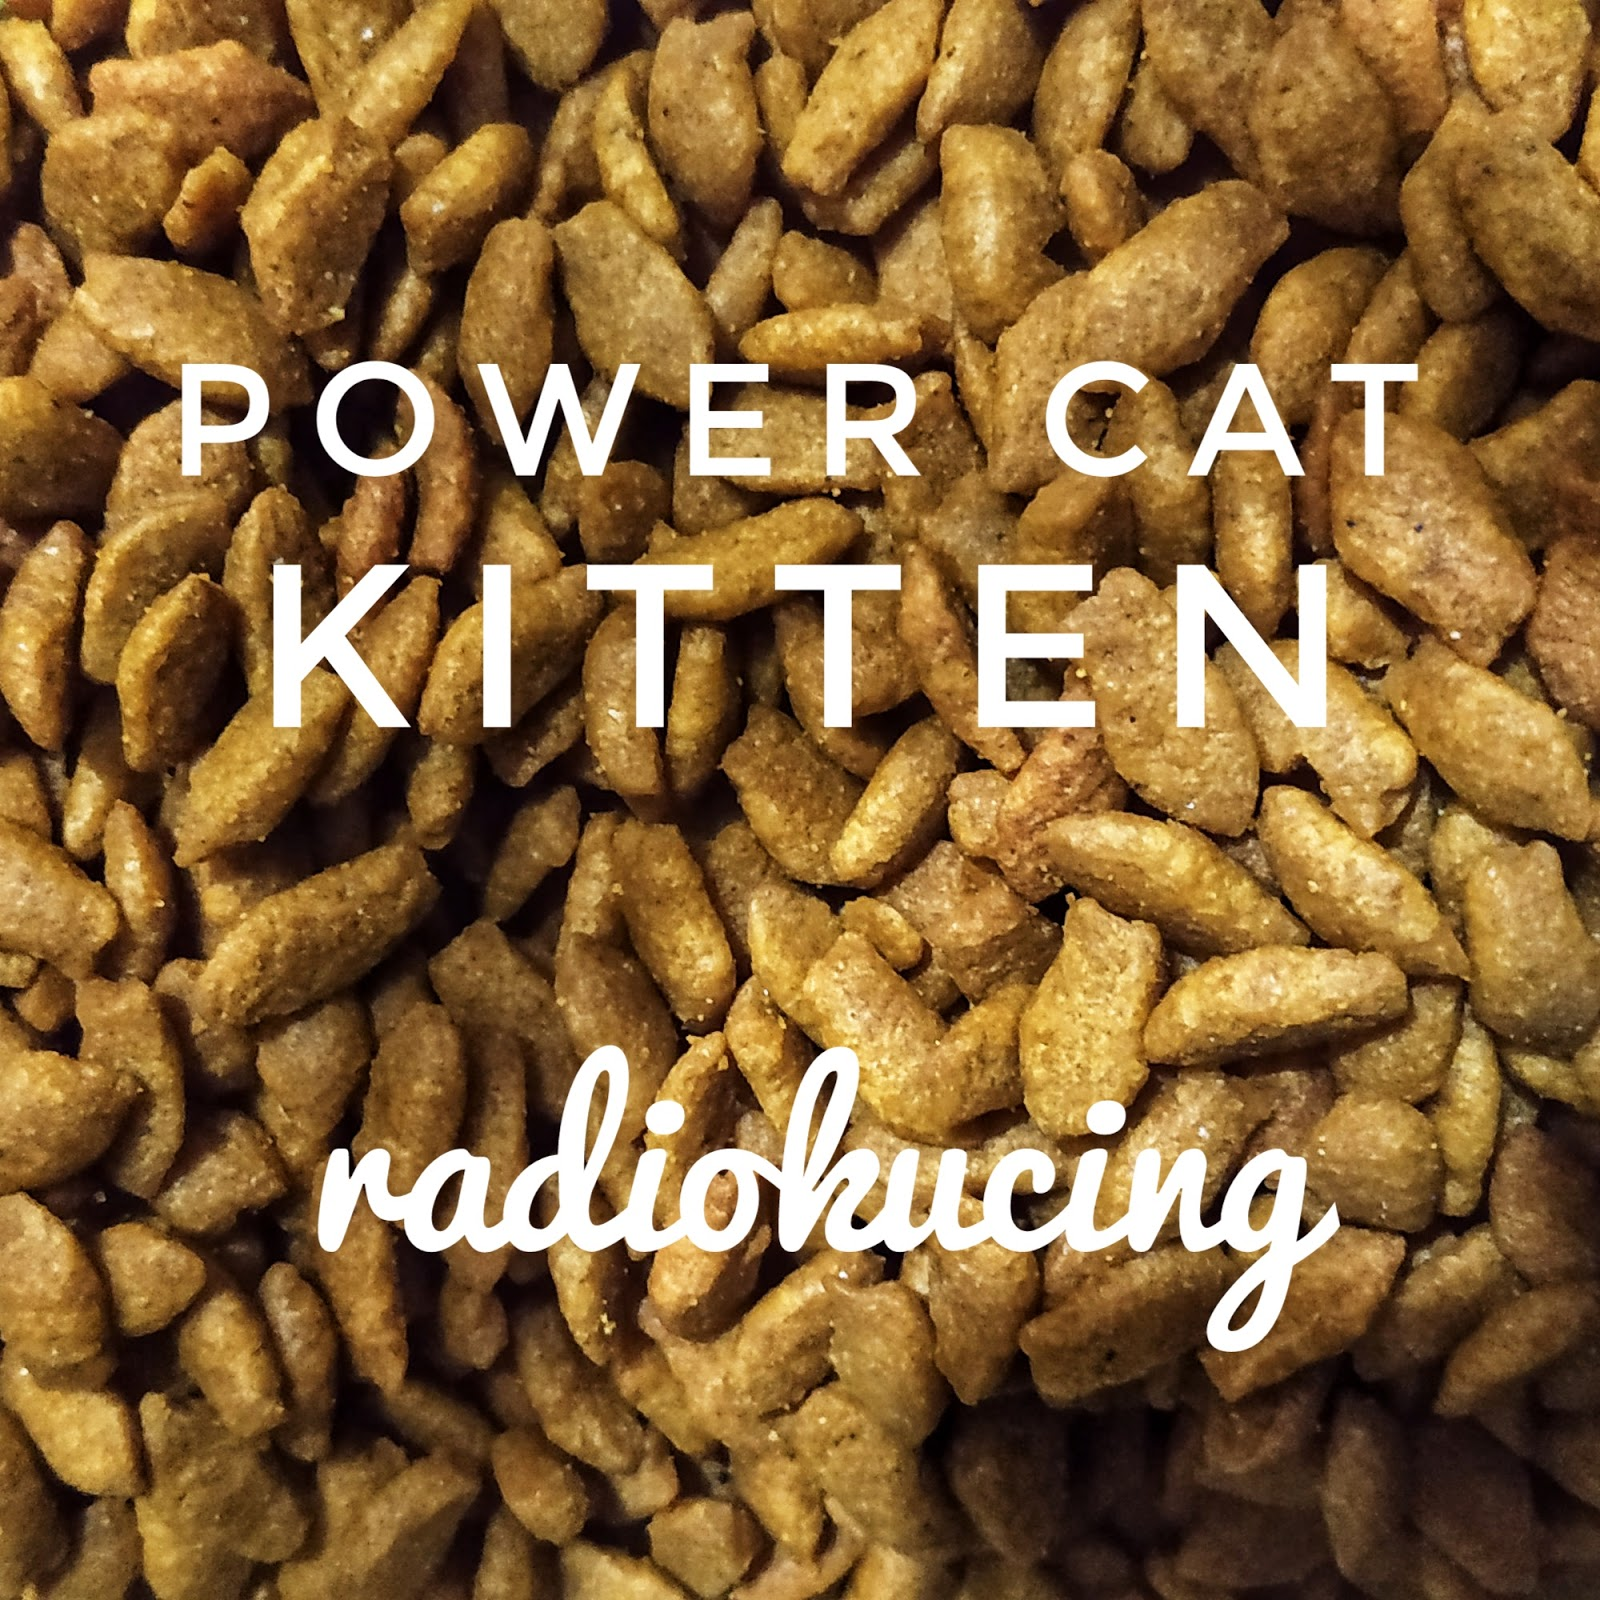 Review Makanan Kucing Power Cat Kitten Memiminalisir Bau Hingga 95 Lho Radiokucing Com